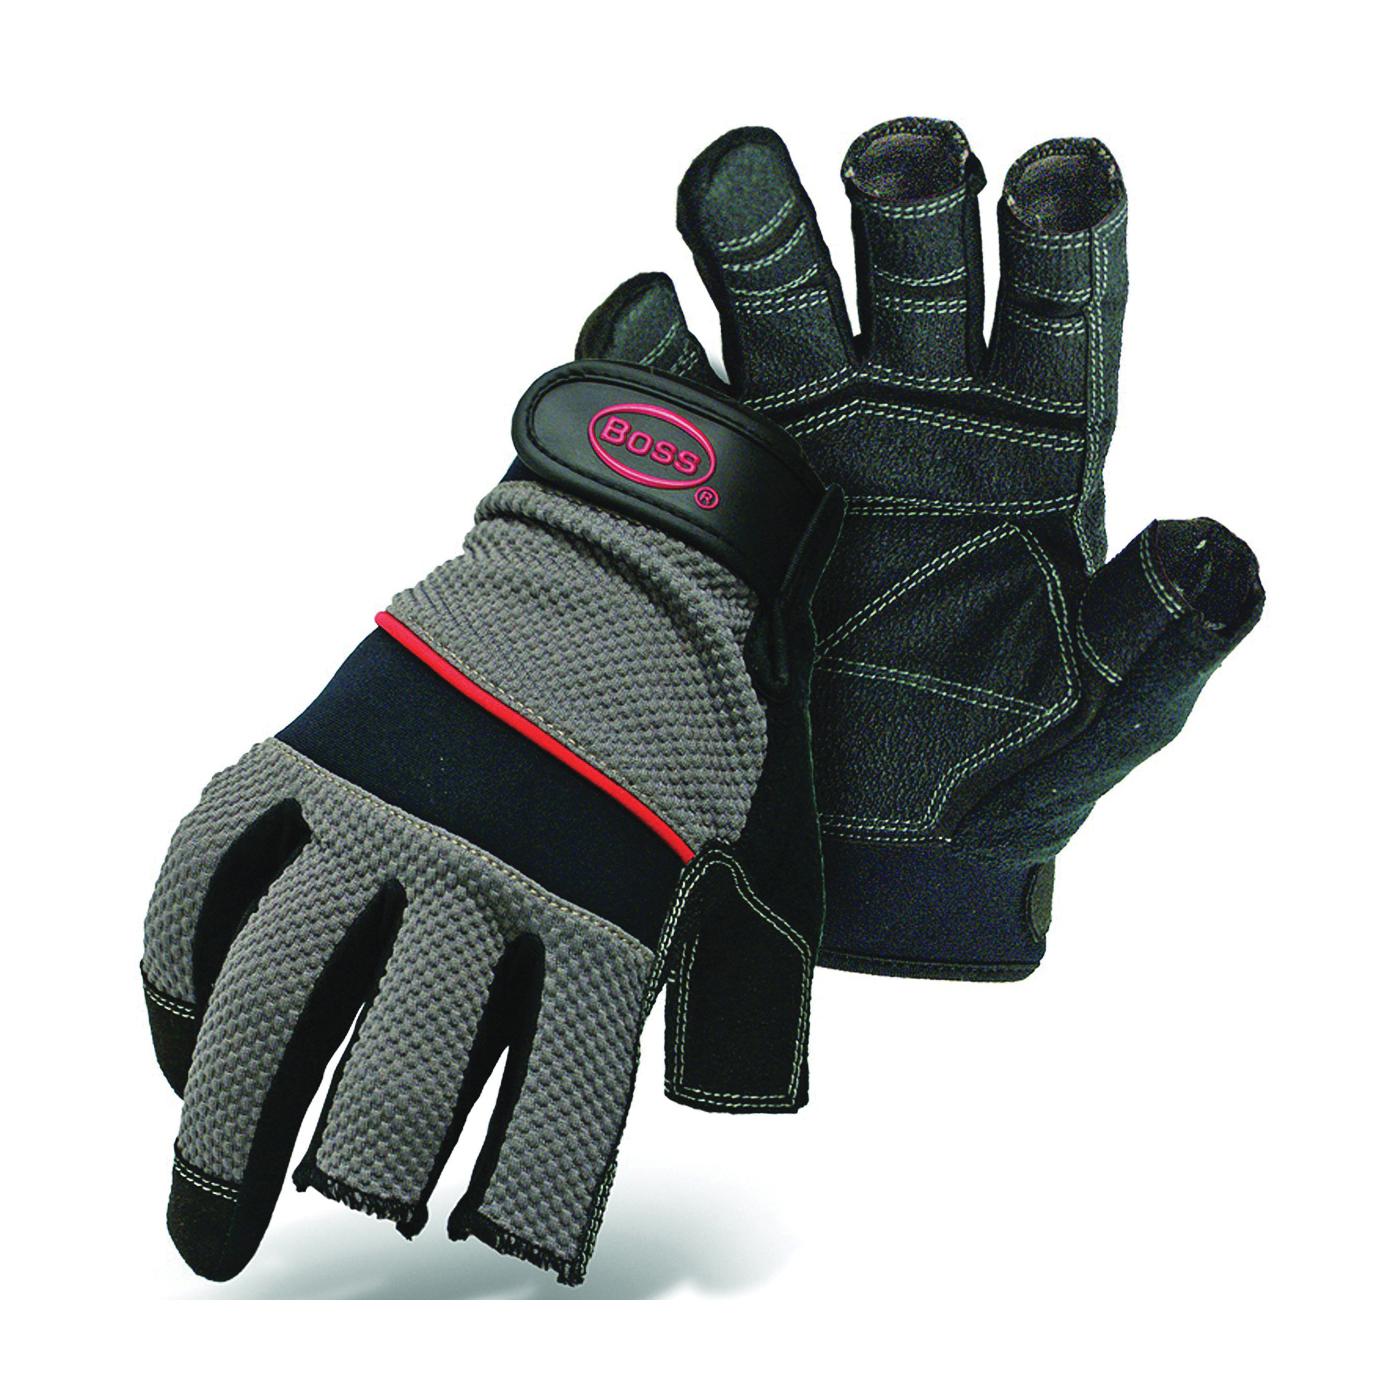 Picture of BOSS 5201L Breathable Carpenter Gloves, L, Shortened Thumb, Wrist Strap Cuff, PVC